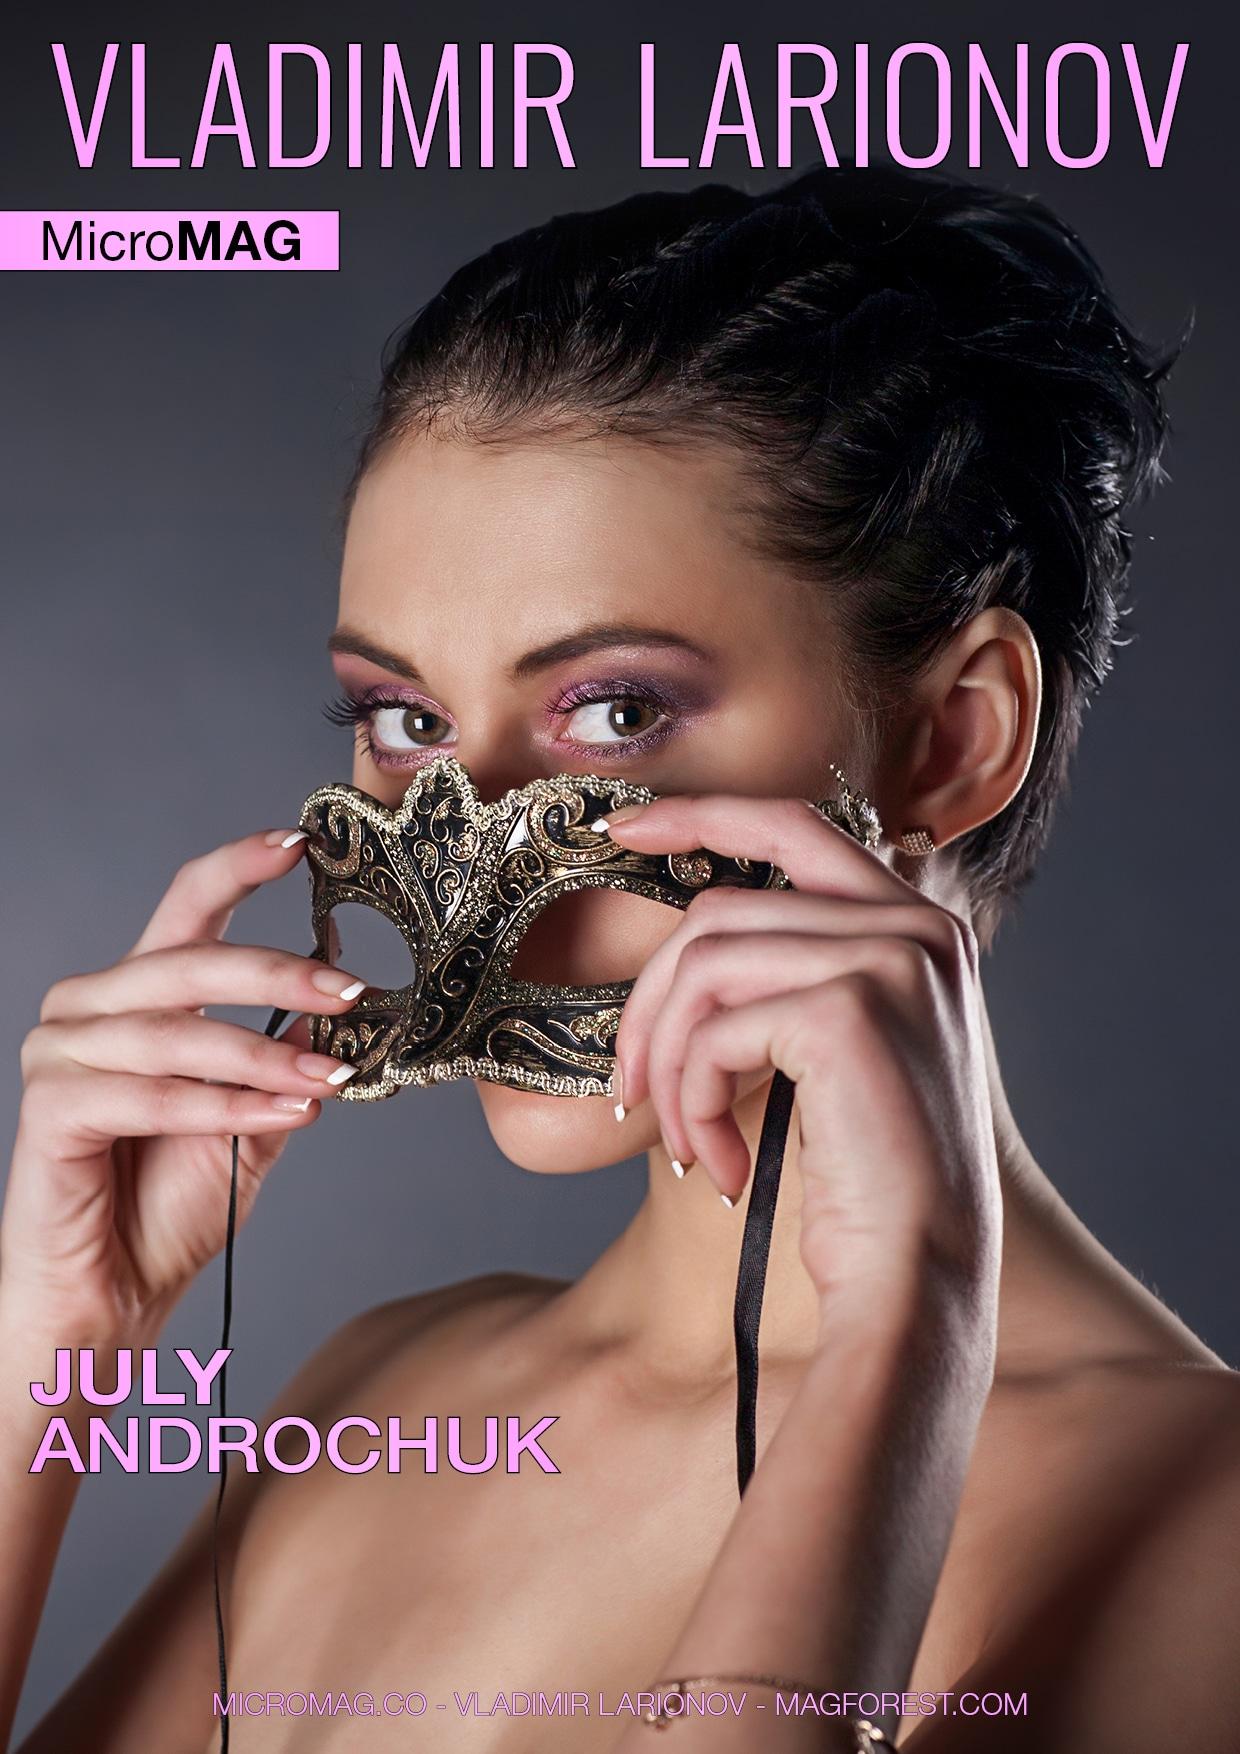 Vladimir Larionov MicroMAG - July Androchuk - Issue 1 4